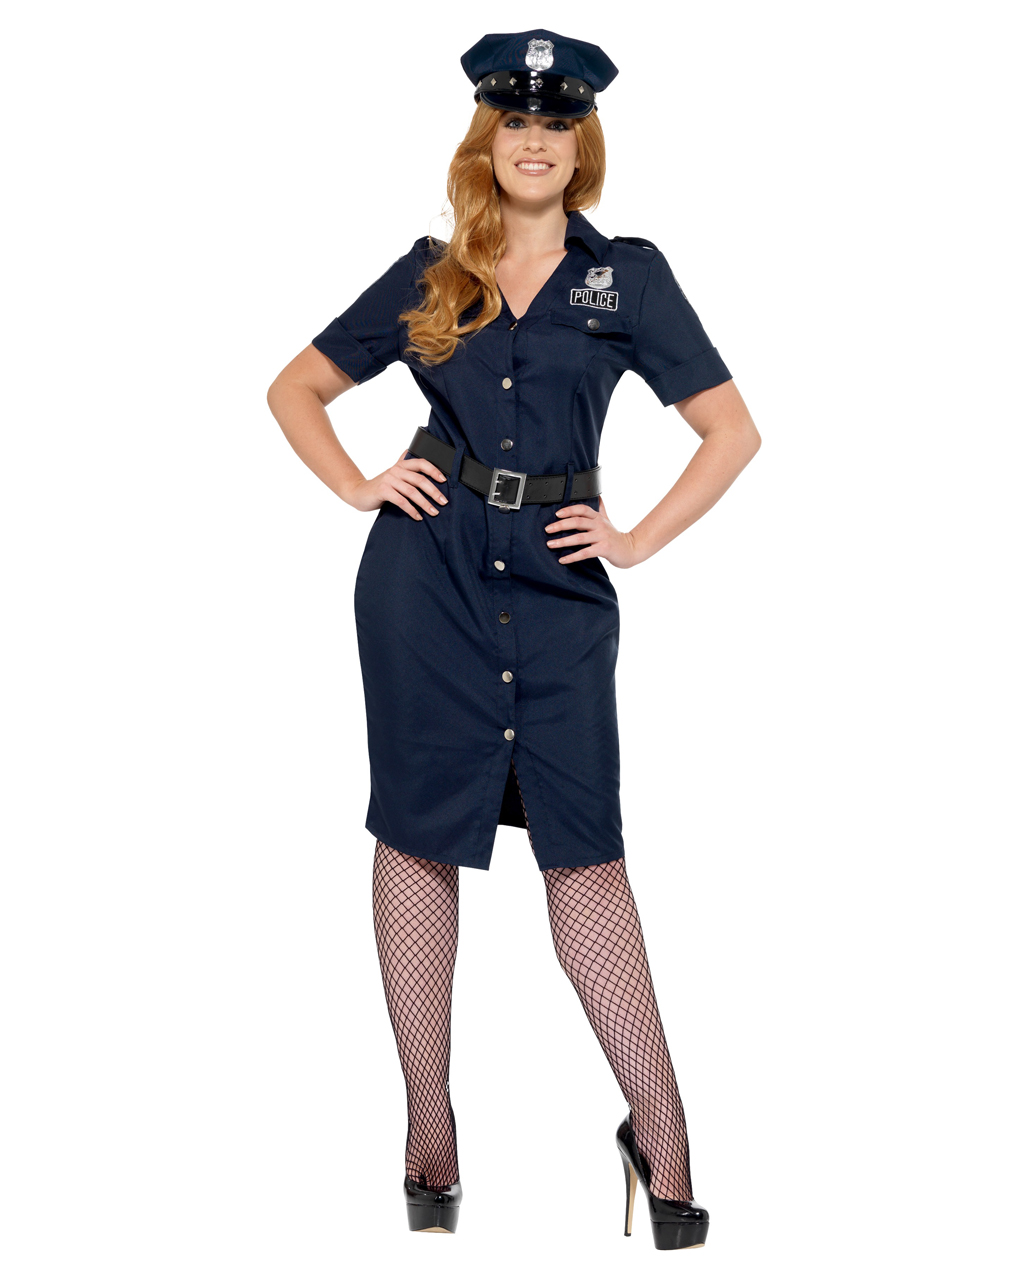 Curvy NYC Policewoman Plus Size Costume Curvy NYC Policewoman Plus Size Costume ...  sc 1 st  Horror-Shop & Curvy NYC Policewoman Plus Size Costume for carnival | horror-shop.com